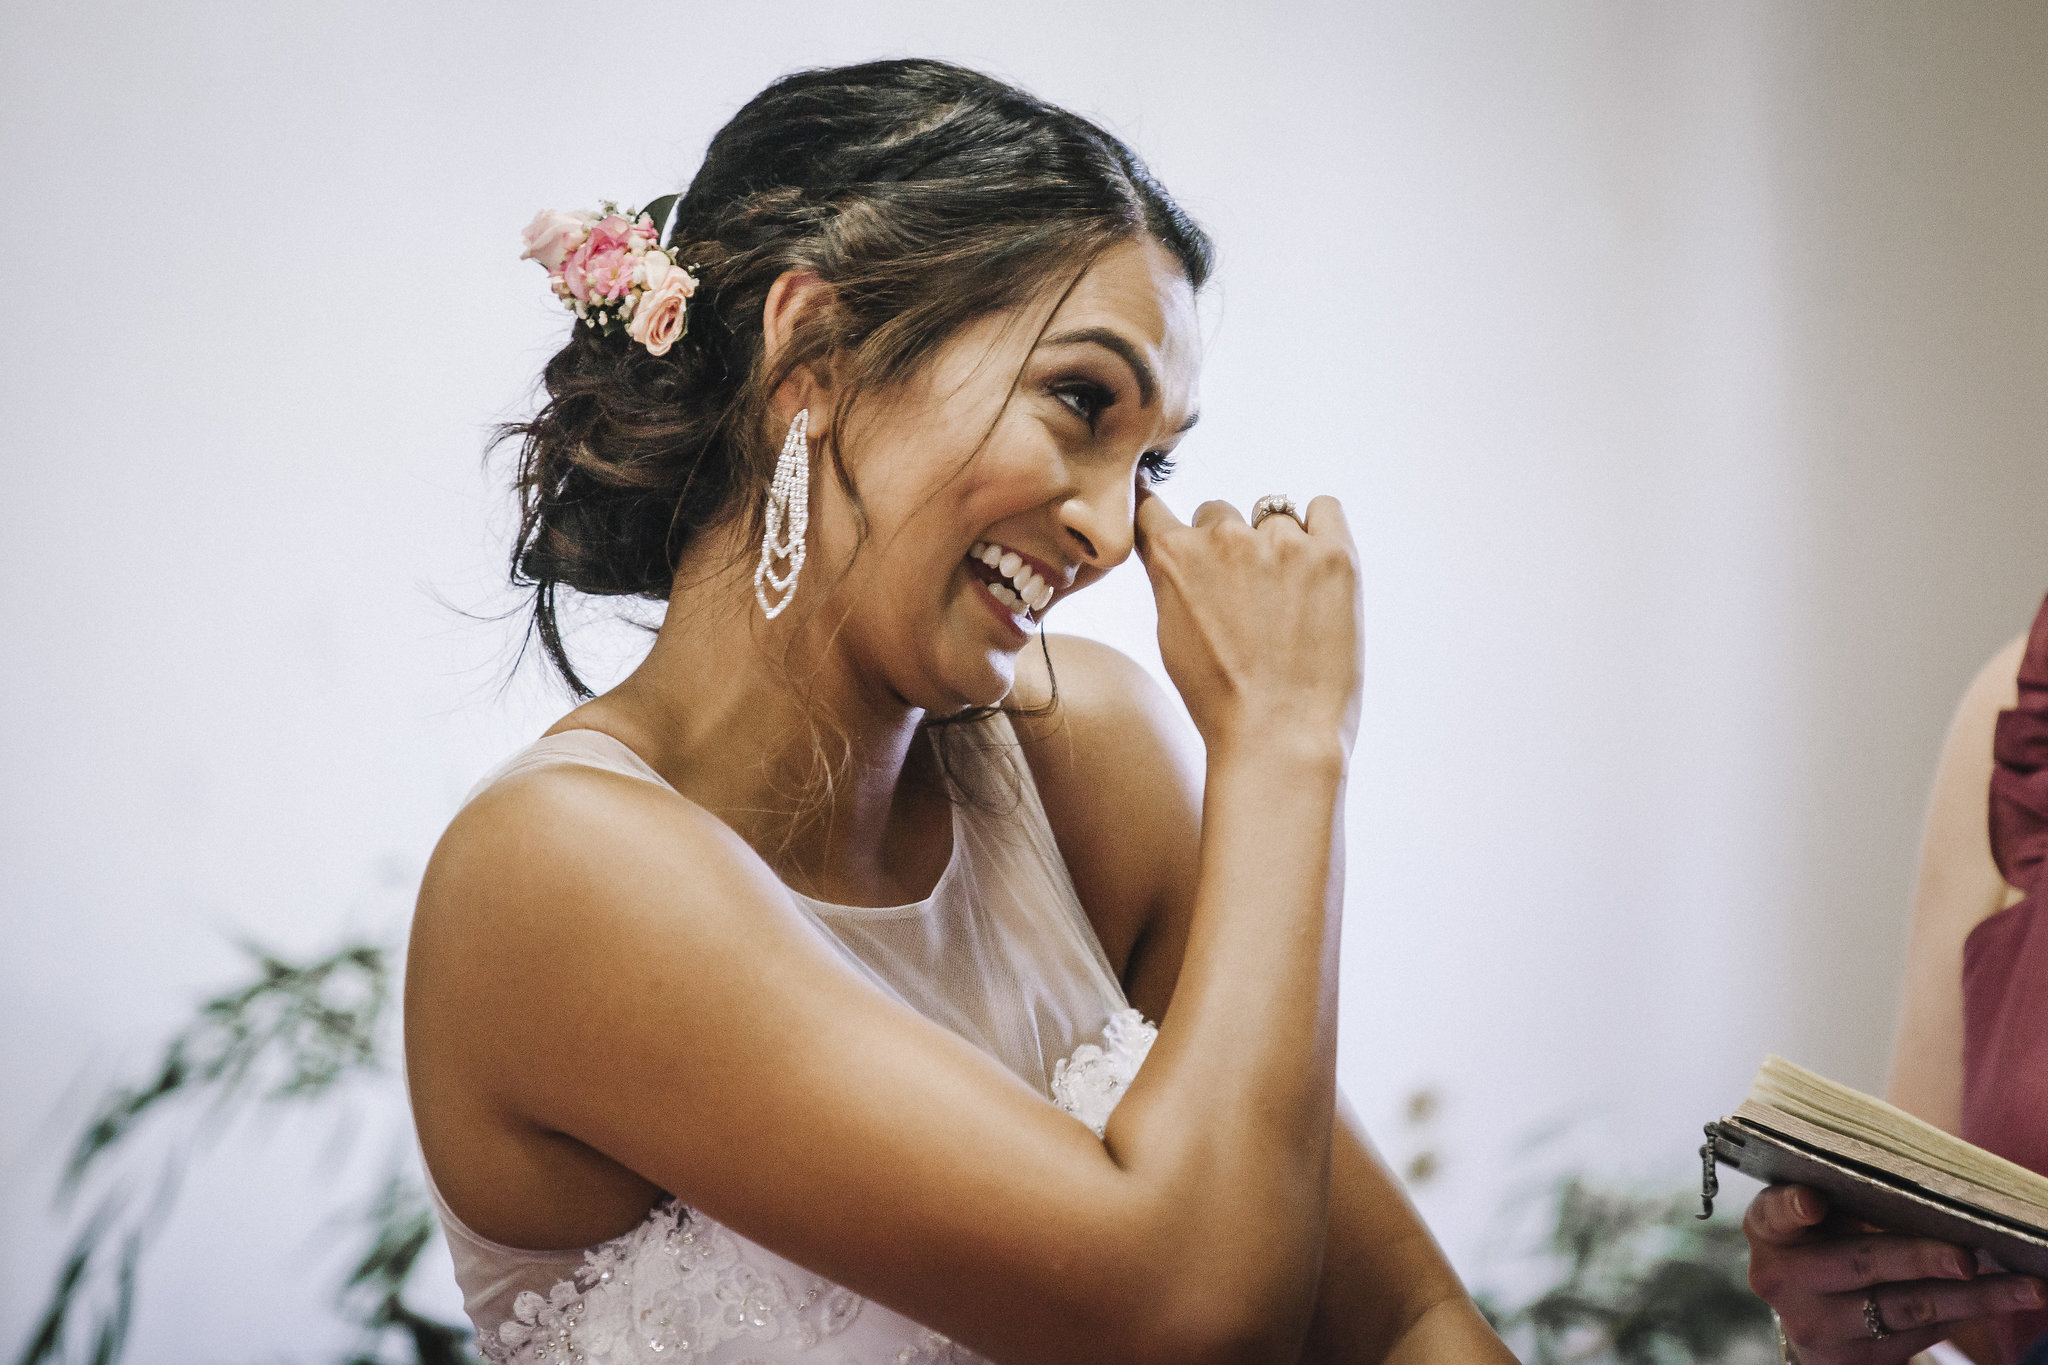 K_P_wedding_045.jpg